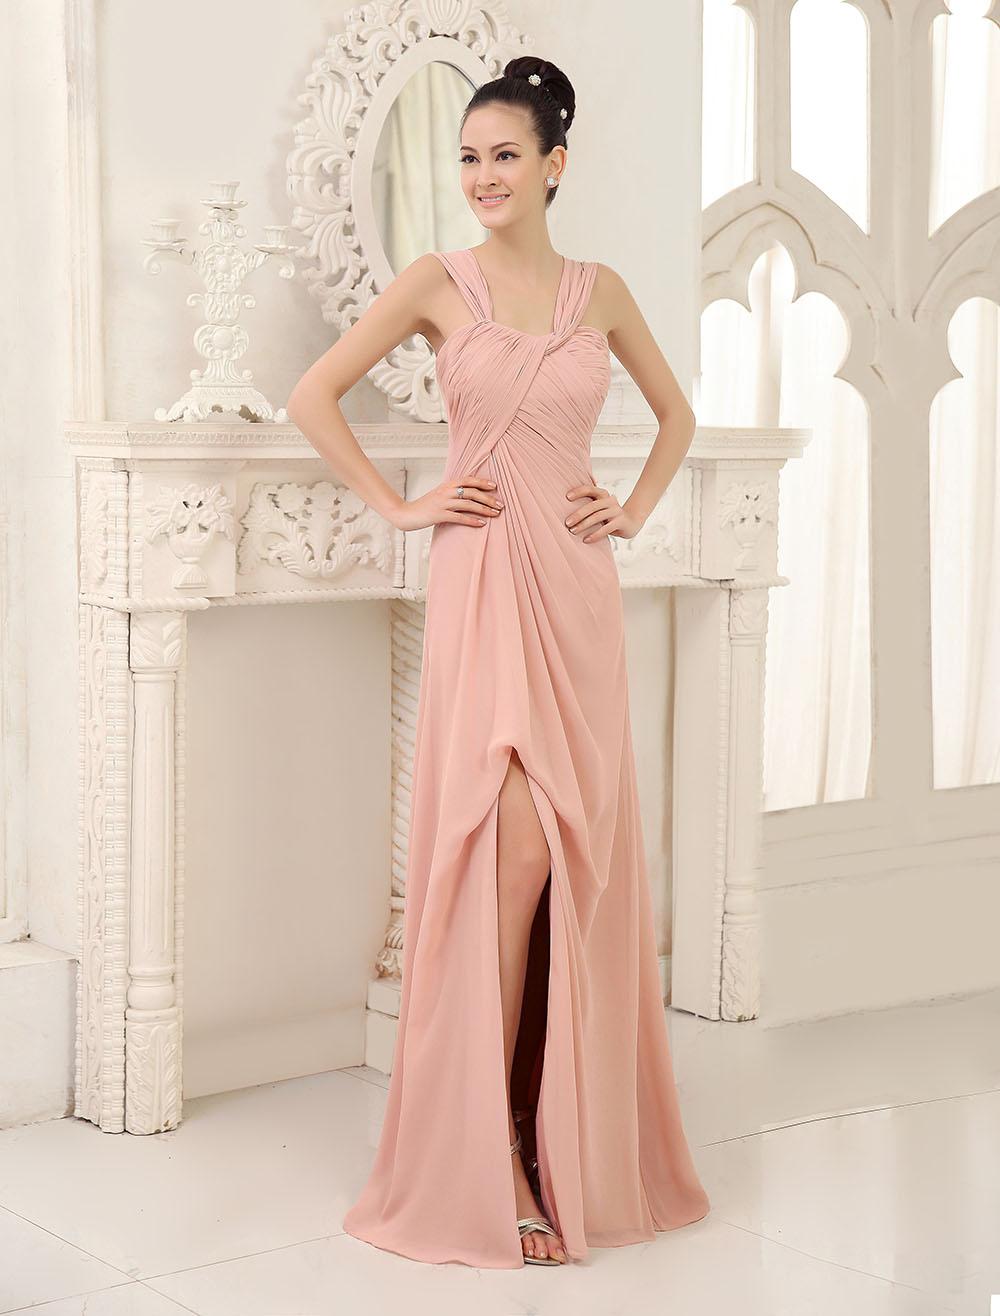 Blush Pink Bridesmaid Dress Long Sleeveless Chiffon Prom Dress High Split Pleated Straps Floor Length Wedding Party Dress (Bridesmaid Dresses) photo